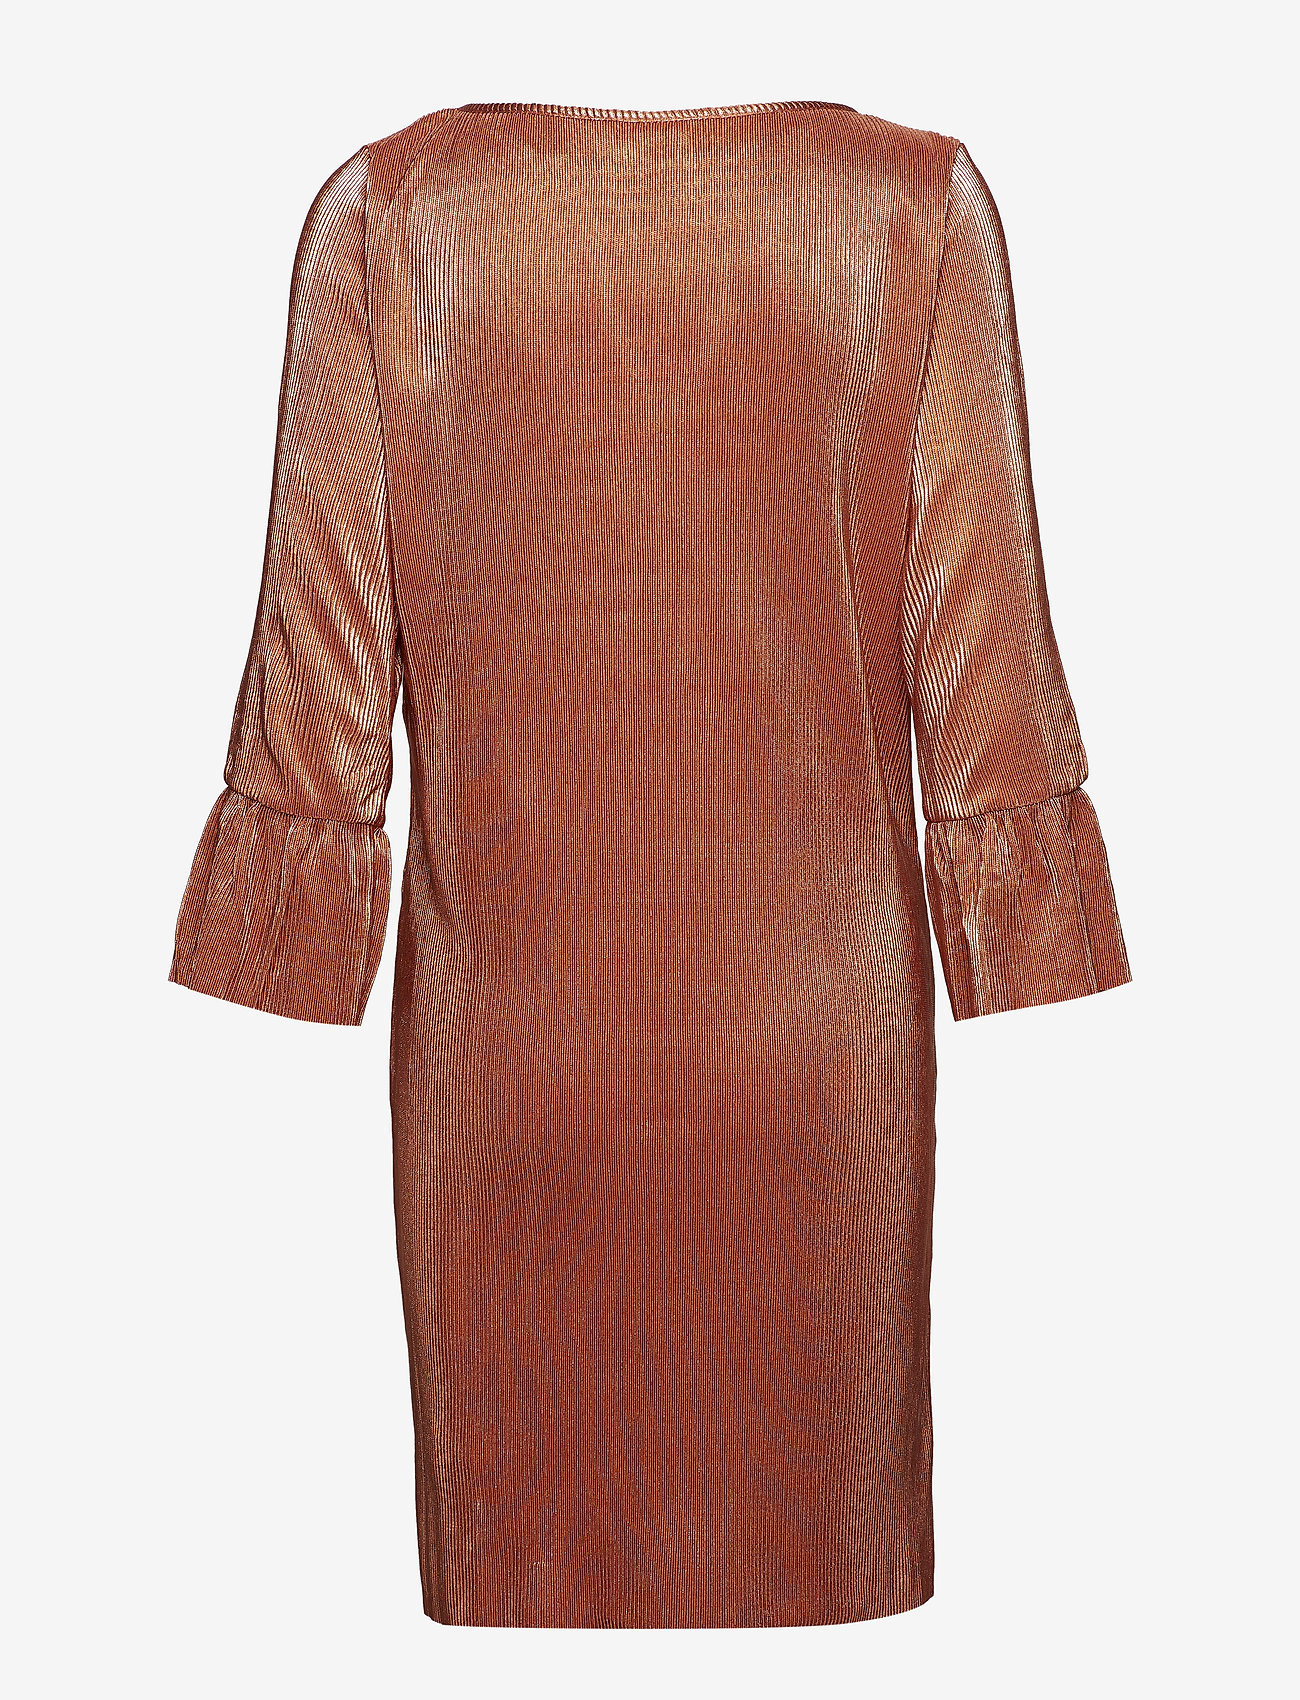 Vila - VIPARTA 3/4 DRESS - midi dresses - redwood - 1